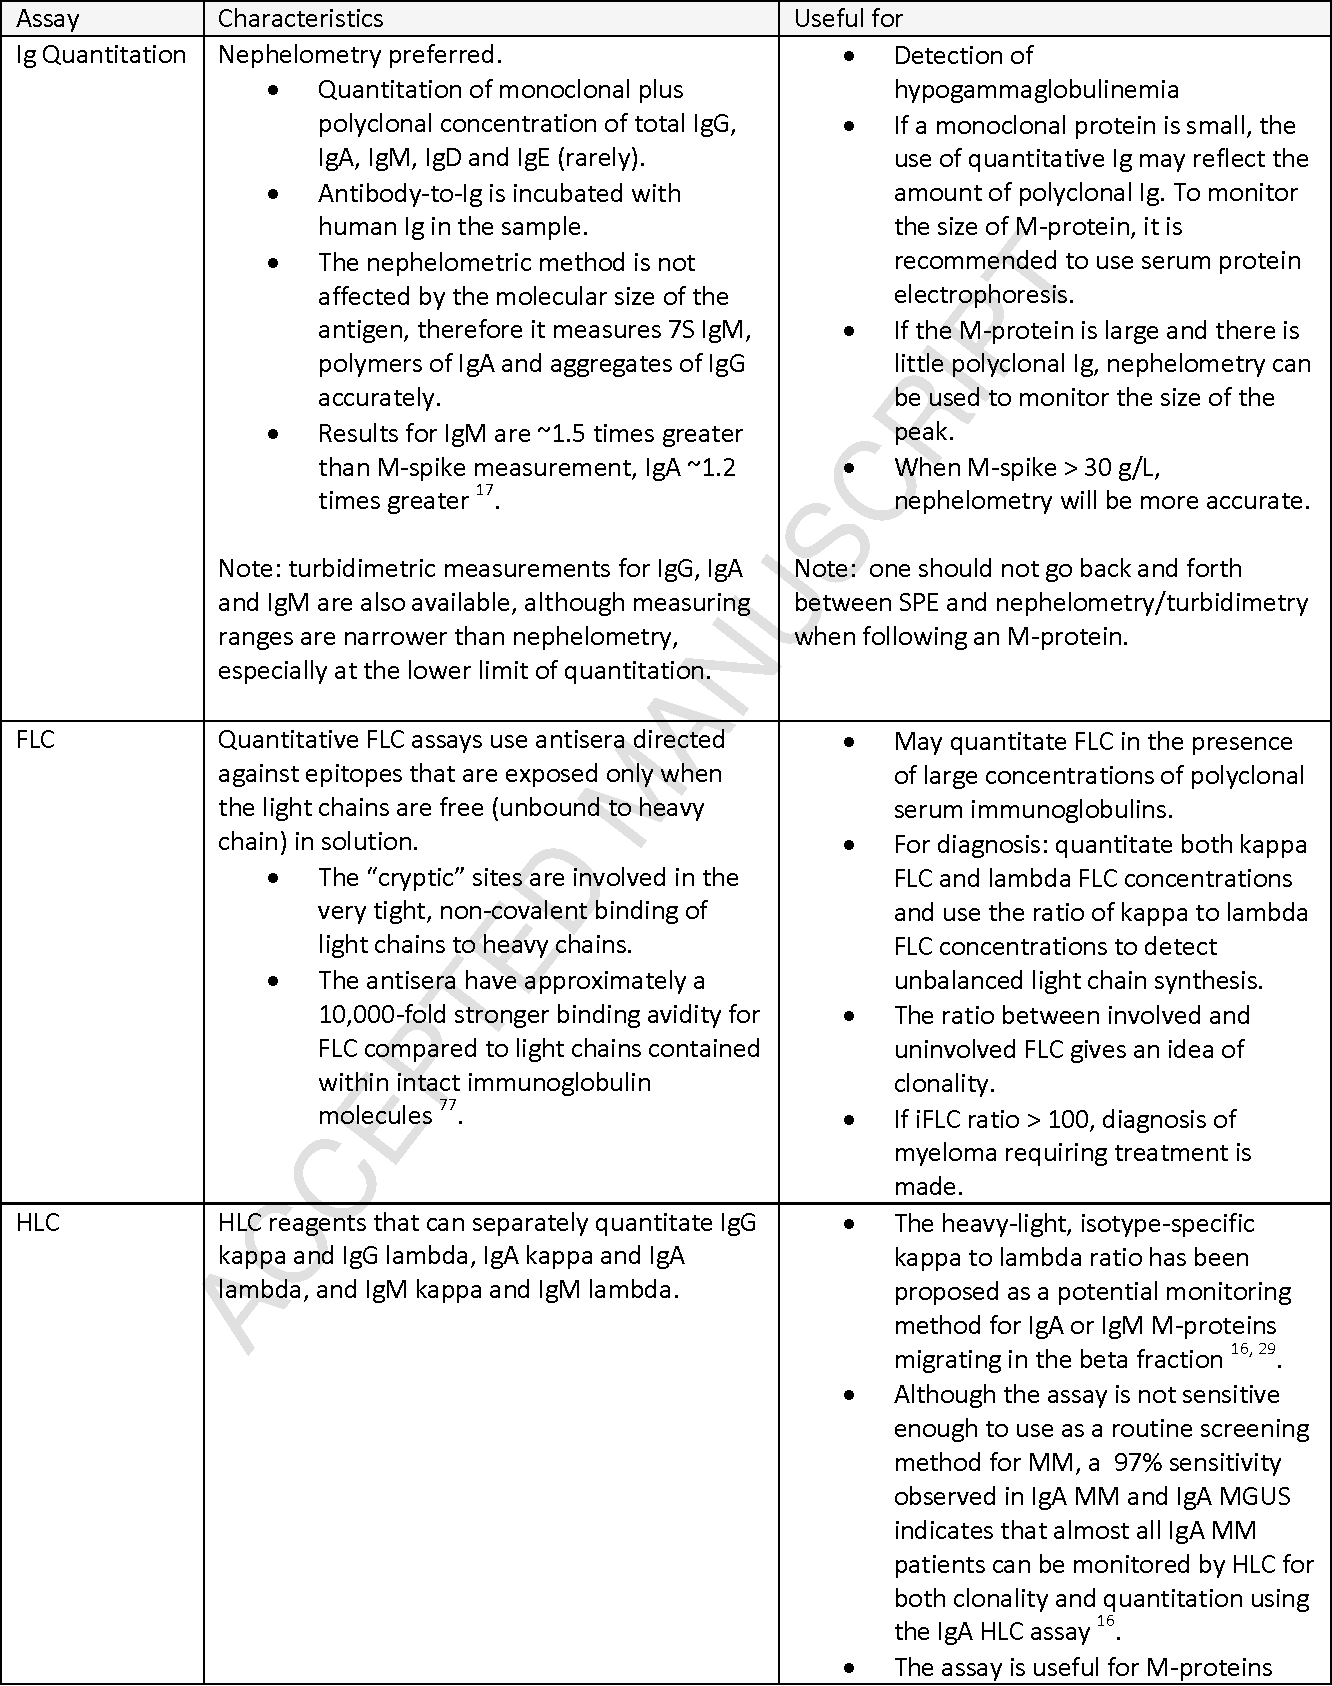 Laboratory testing for monoclonal gammopathies: Focus on monoclonal